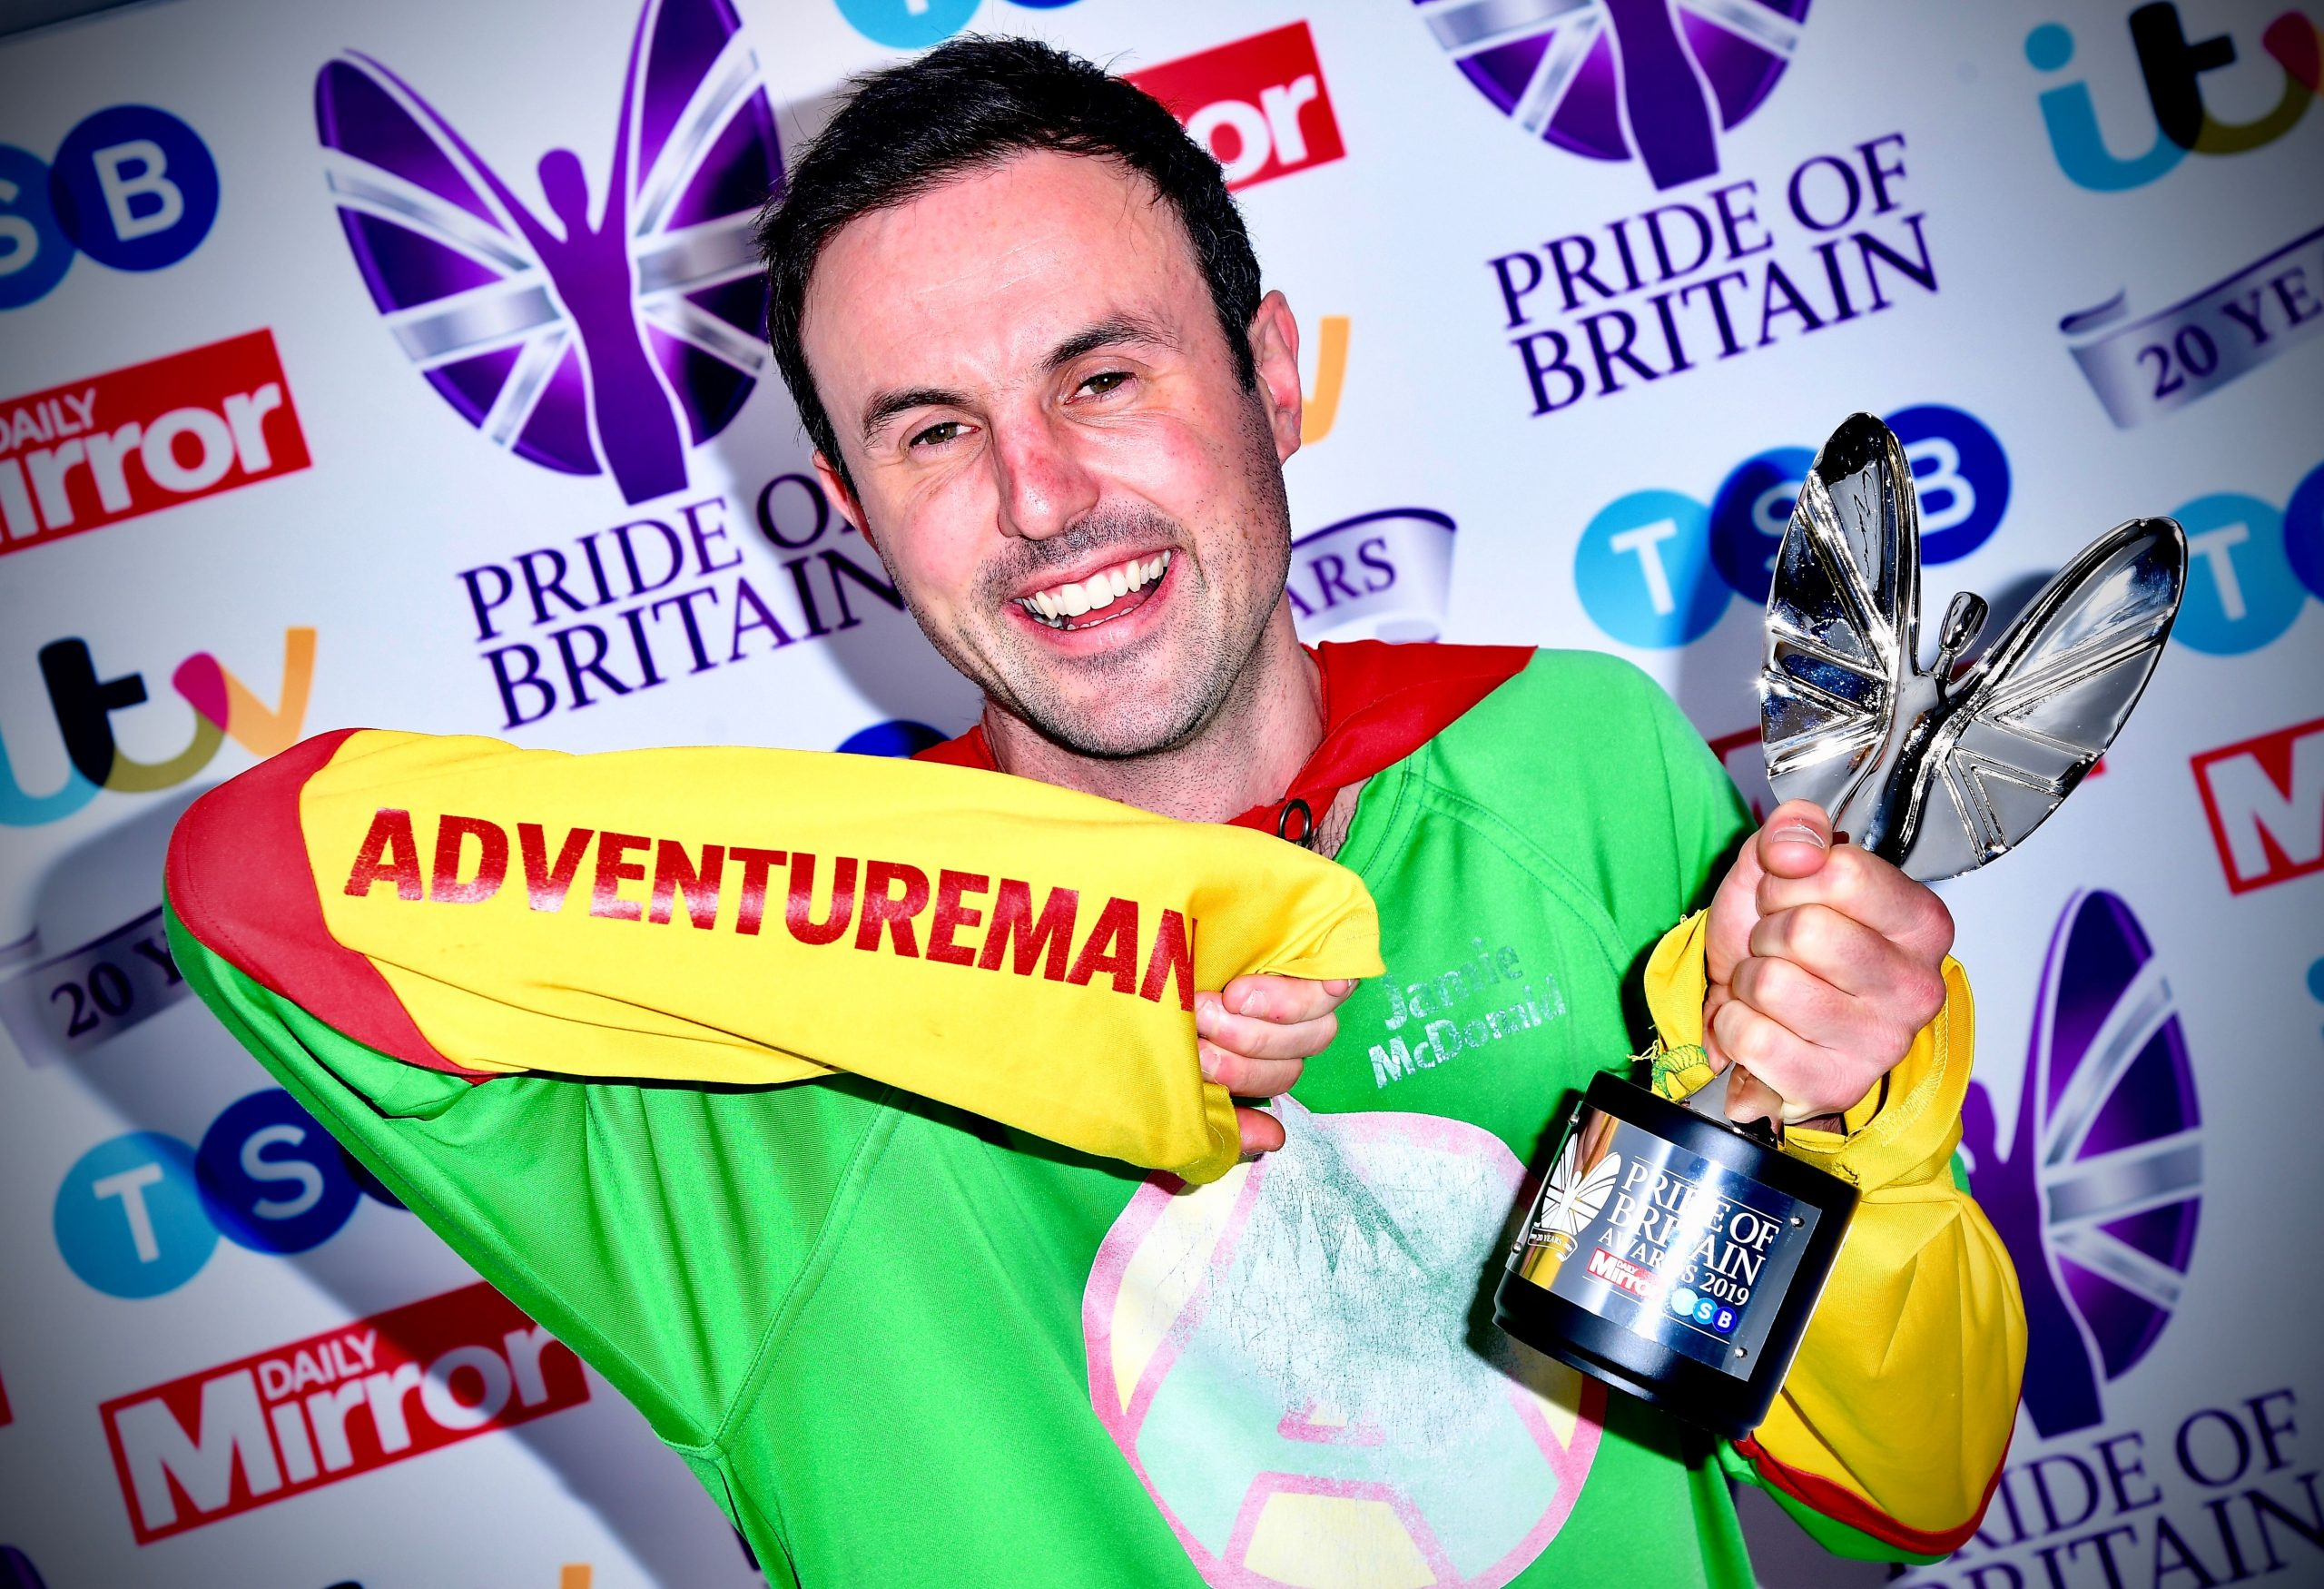 Motivational Speaker, Jamie MacDonald, known as Adventureman holding a Pride of Britain award